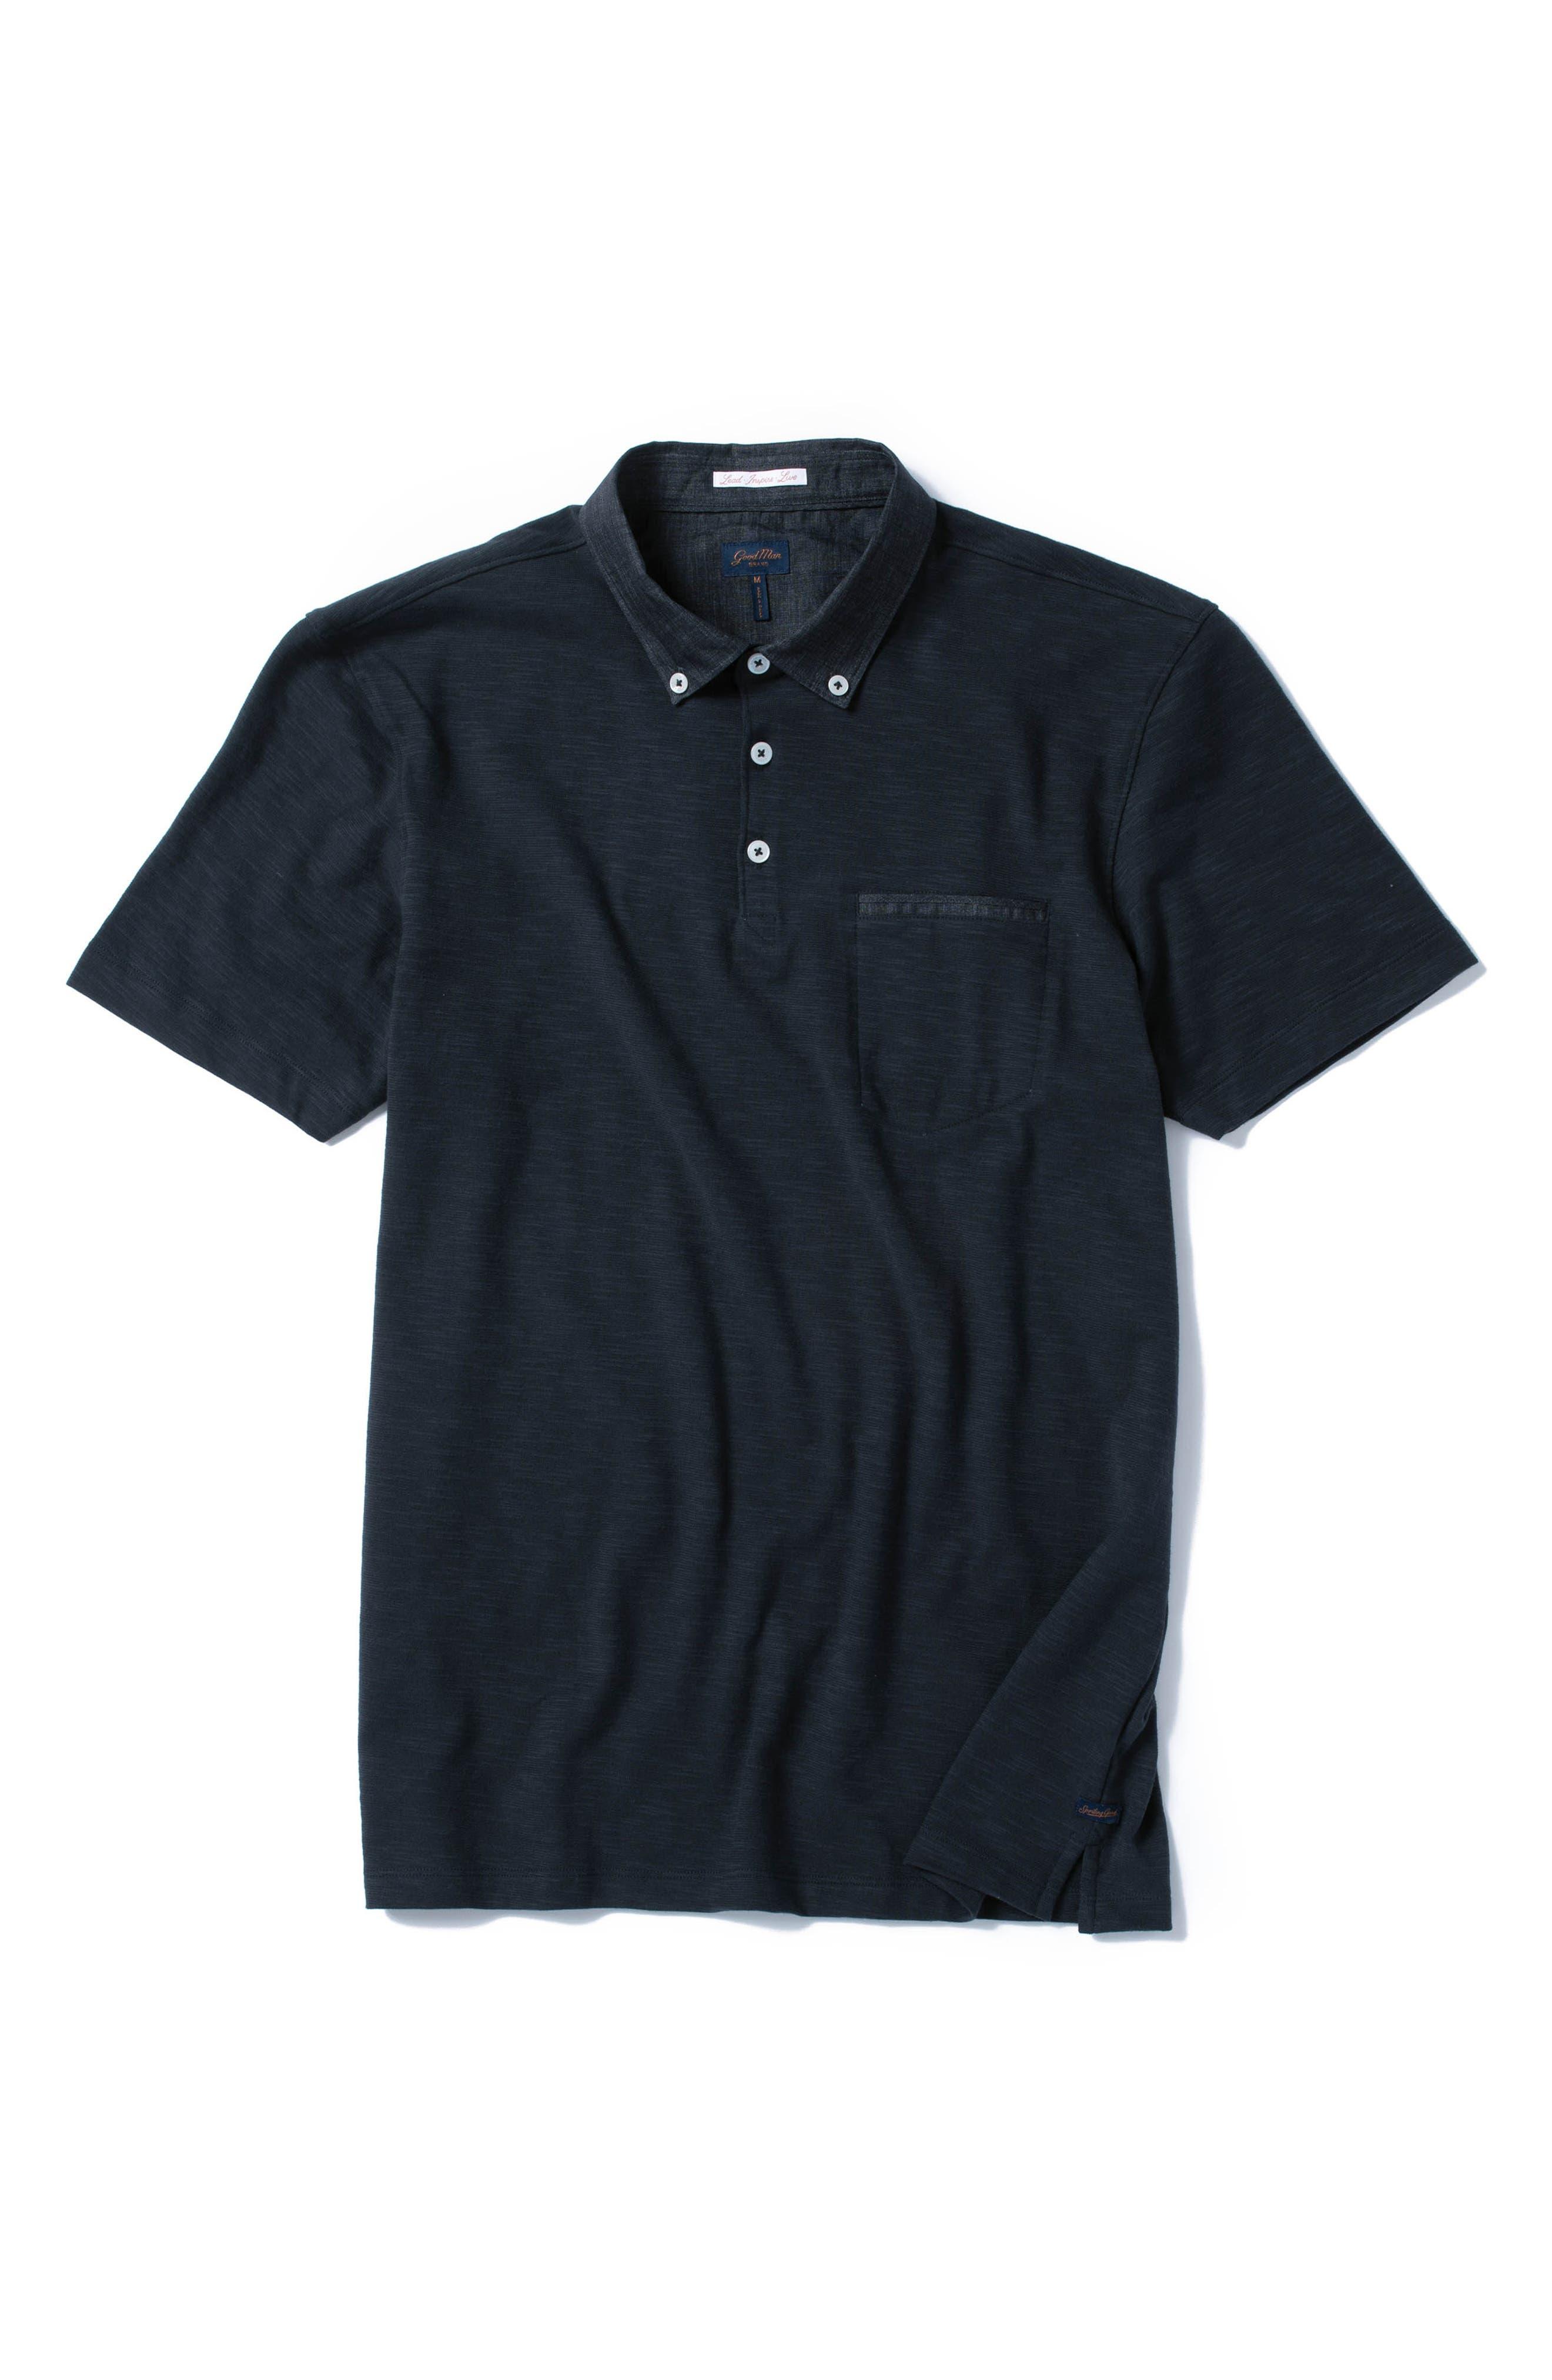 GOOD MAN BRAND, Slub Jersey Cotton Polo Shirt, Alternate thumbnail 6, color, BLACK